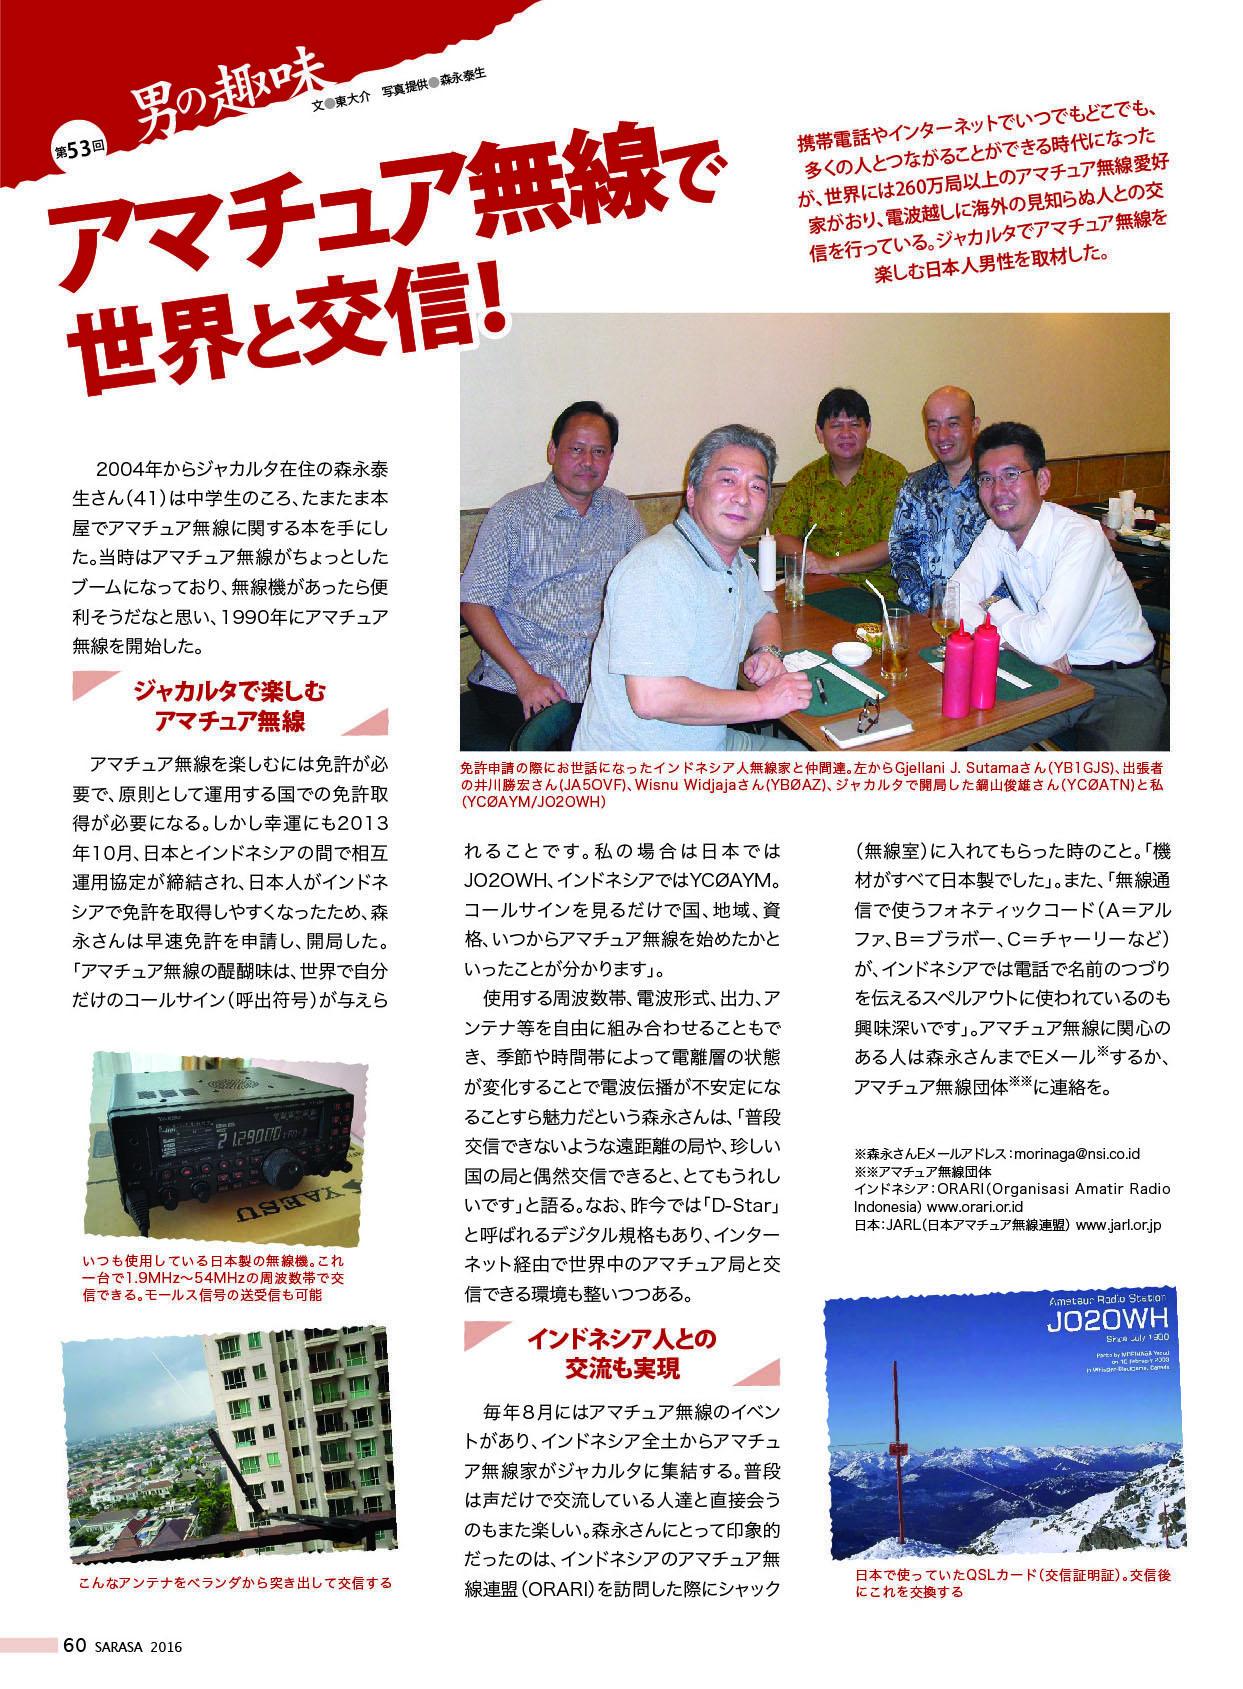 http://www.dreams.gr.jp/~morimori/essay/857/otokonoshumi.jpg